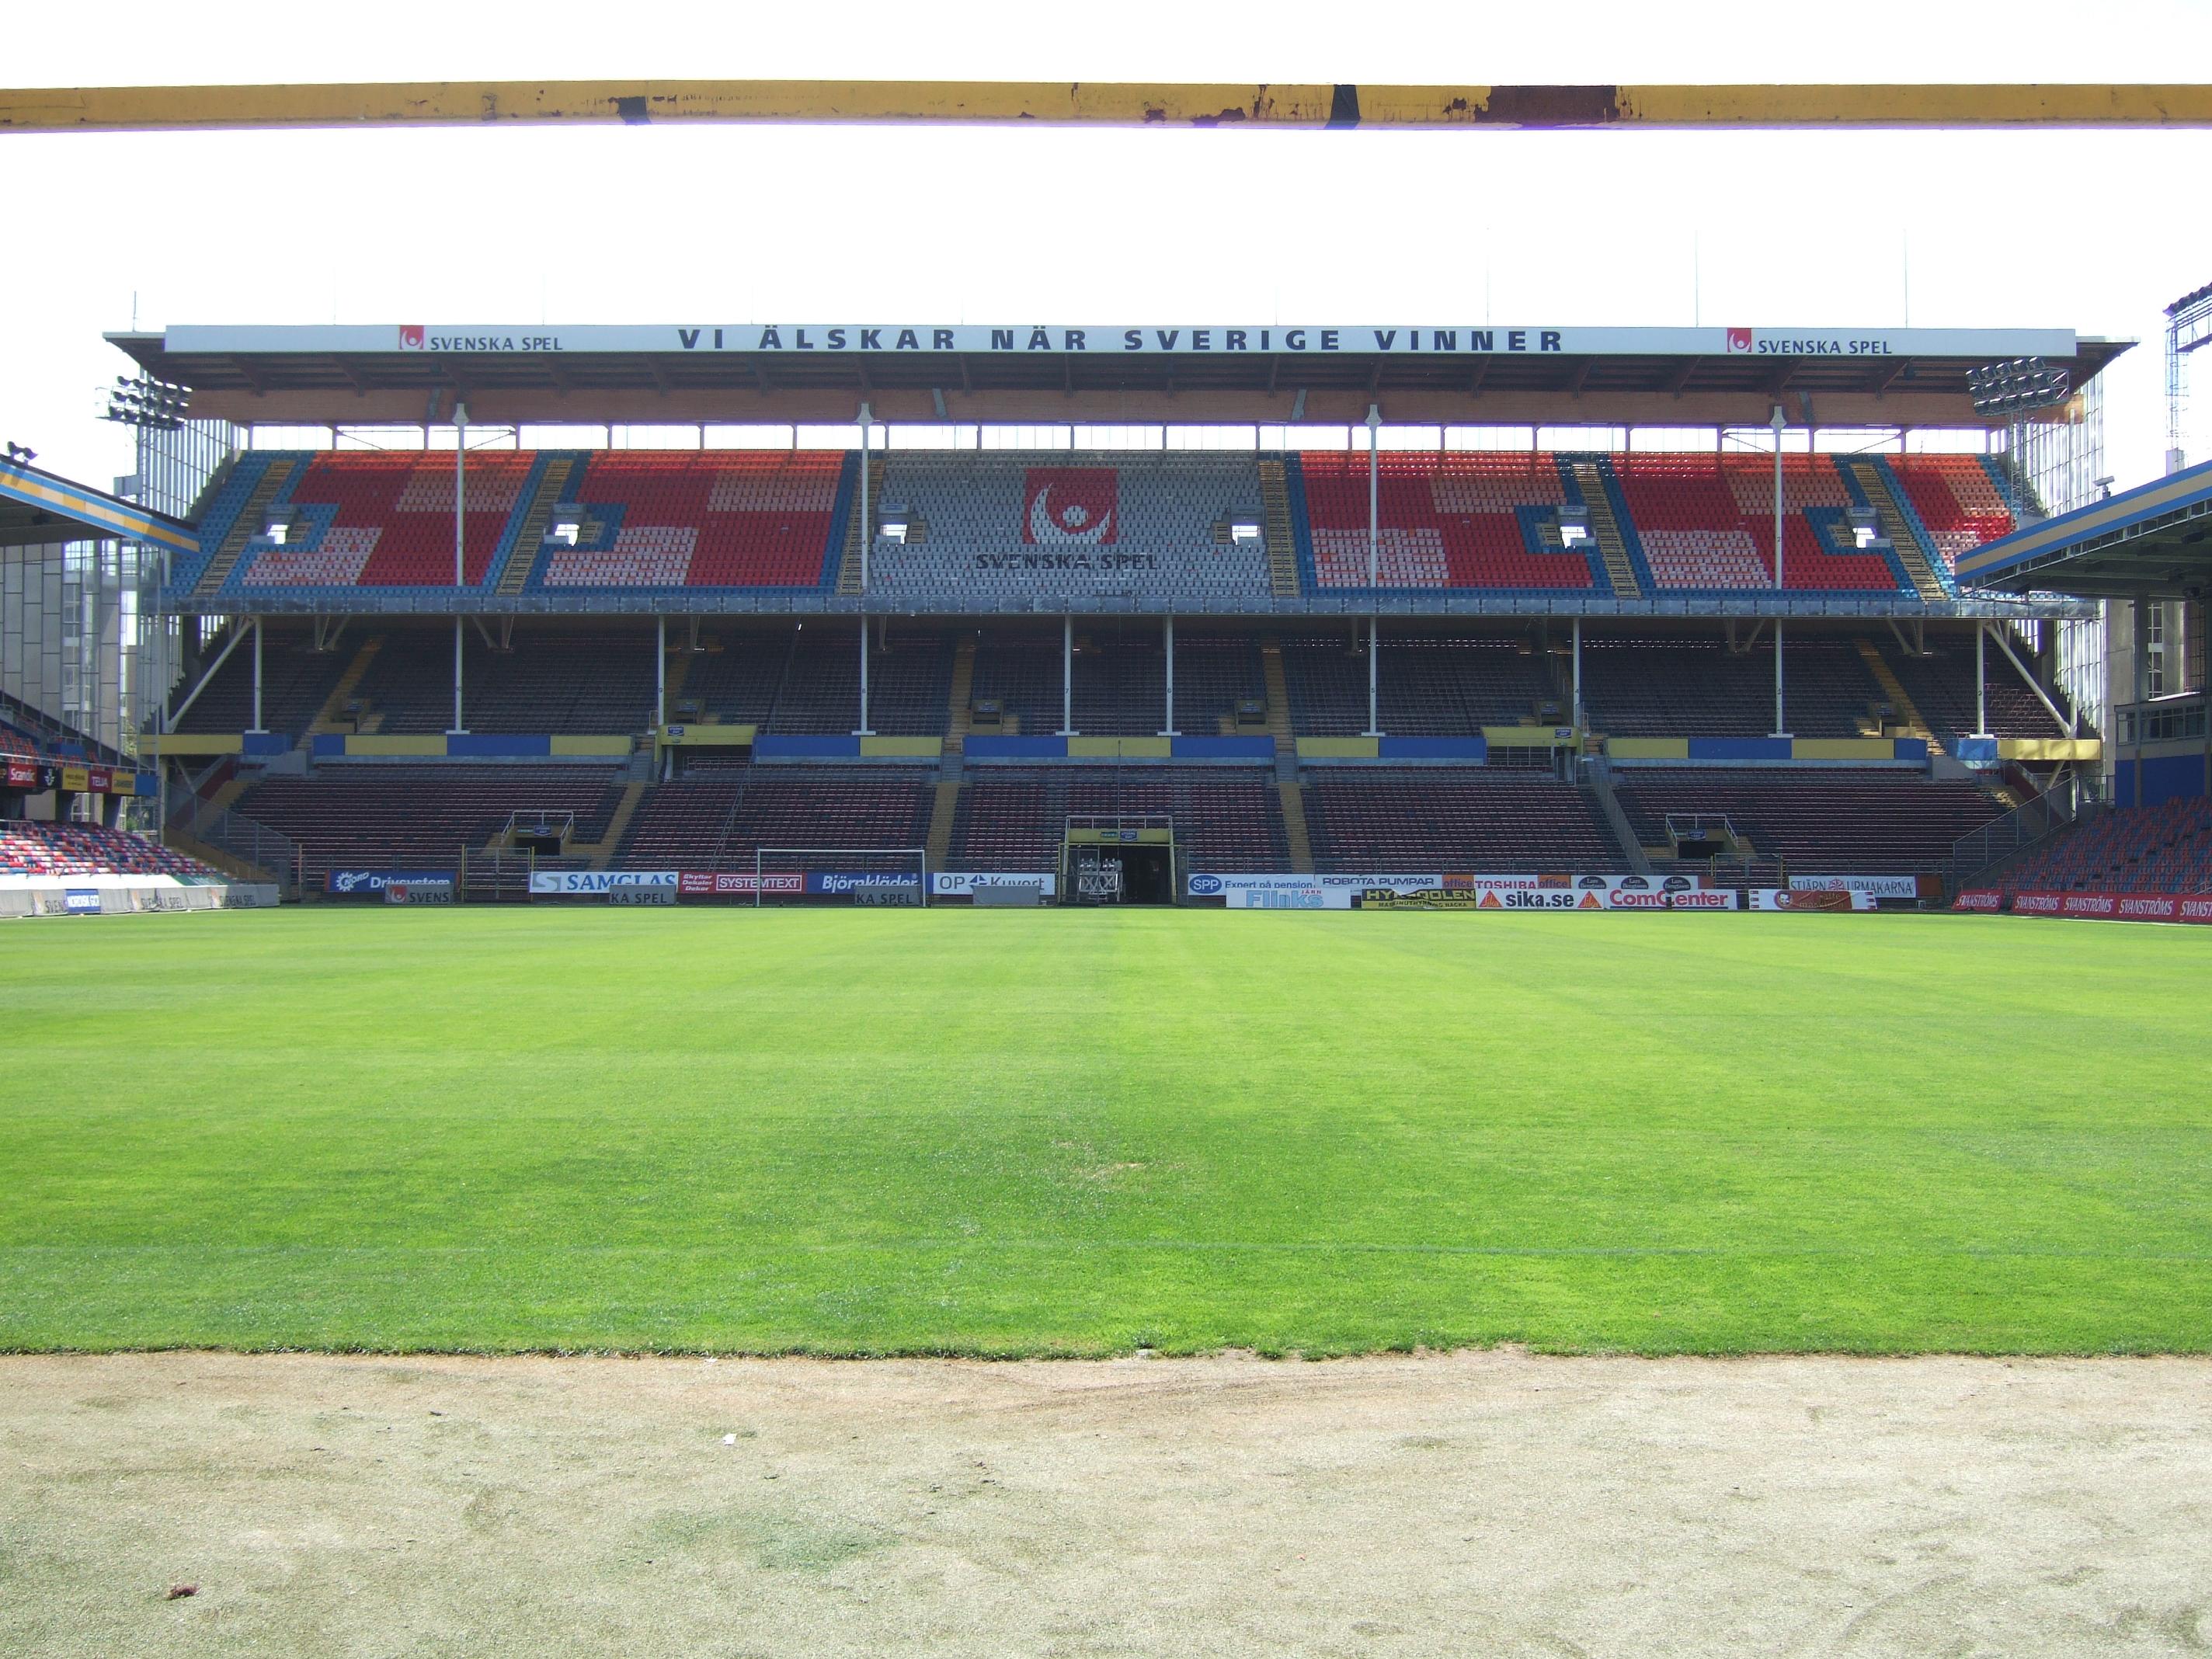 Svenska cupen i fotboll 2006 – Wikipedia 9d86a186d1b18